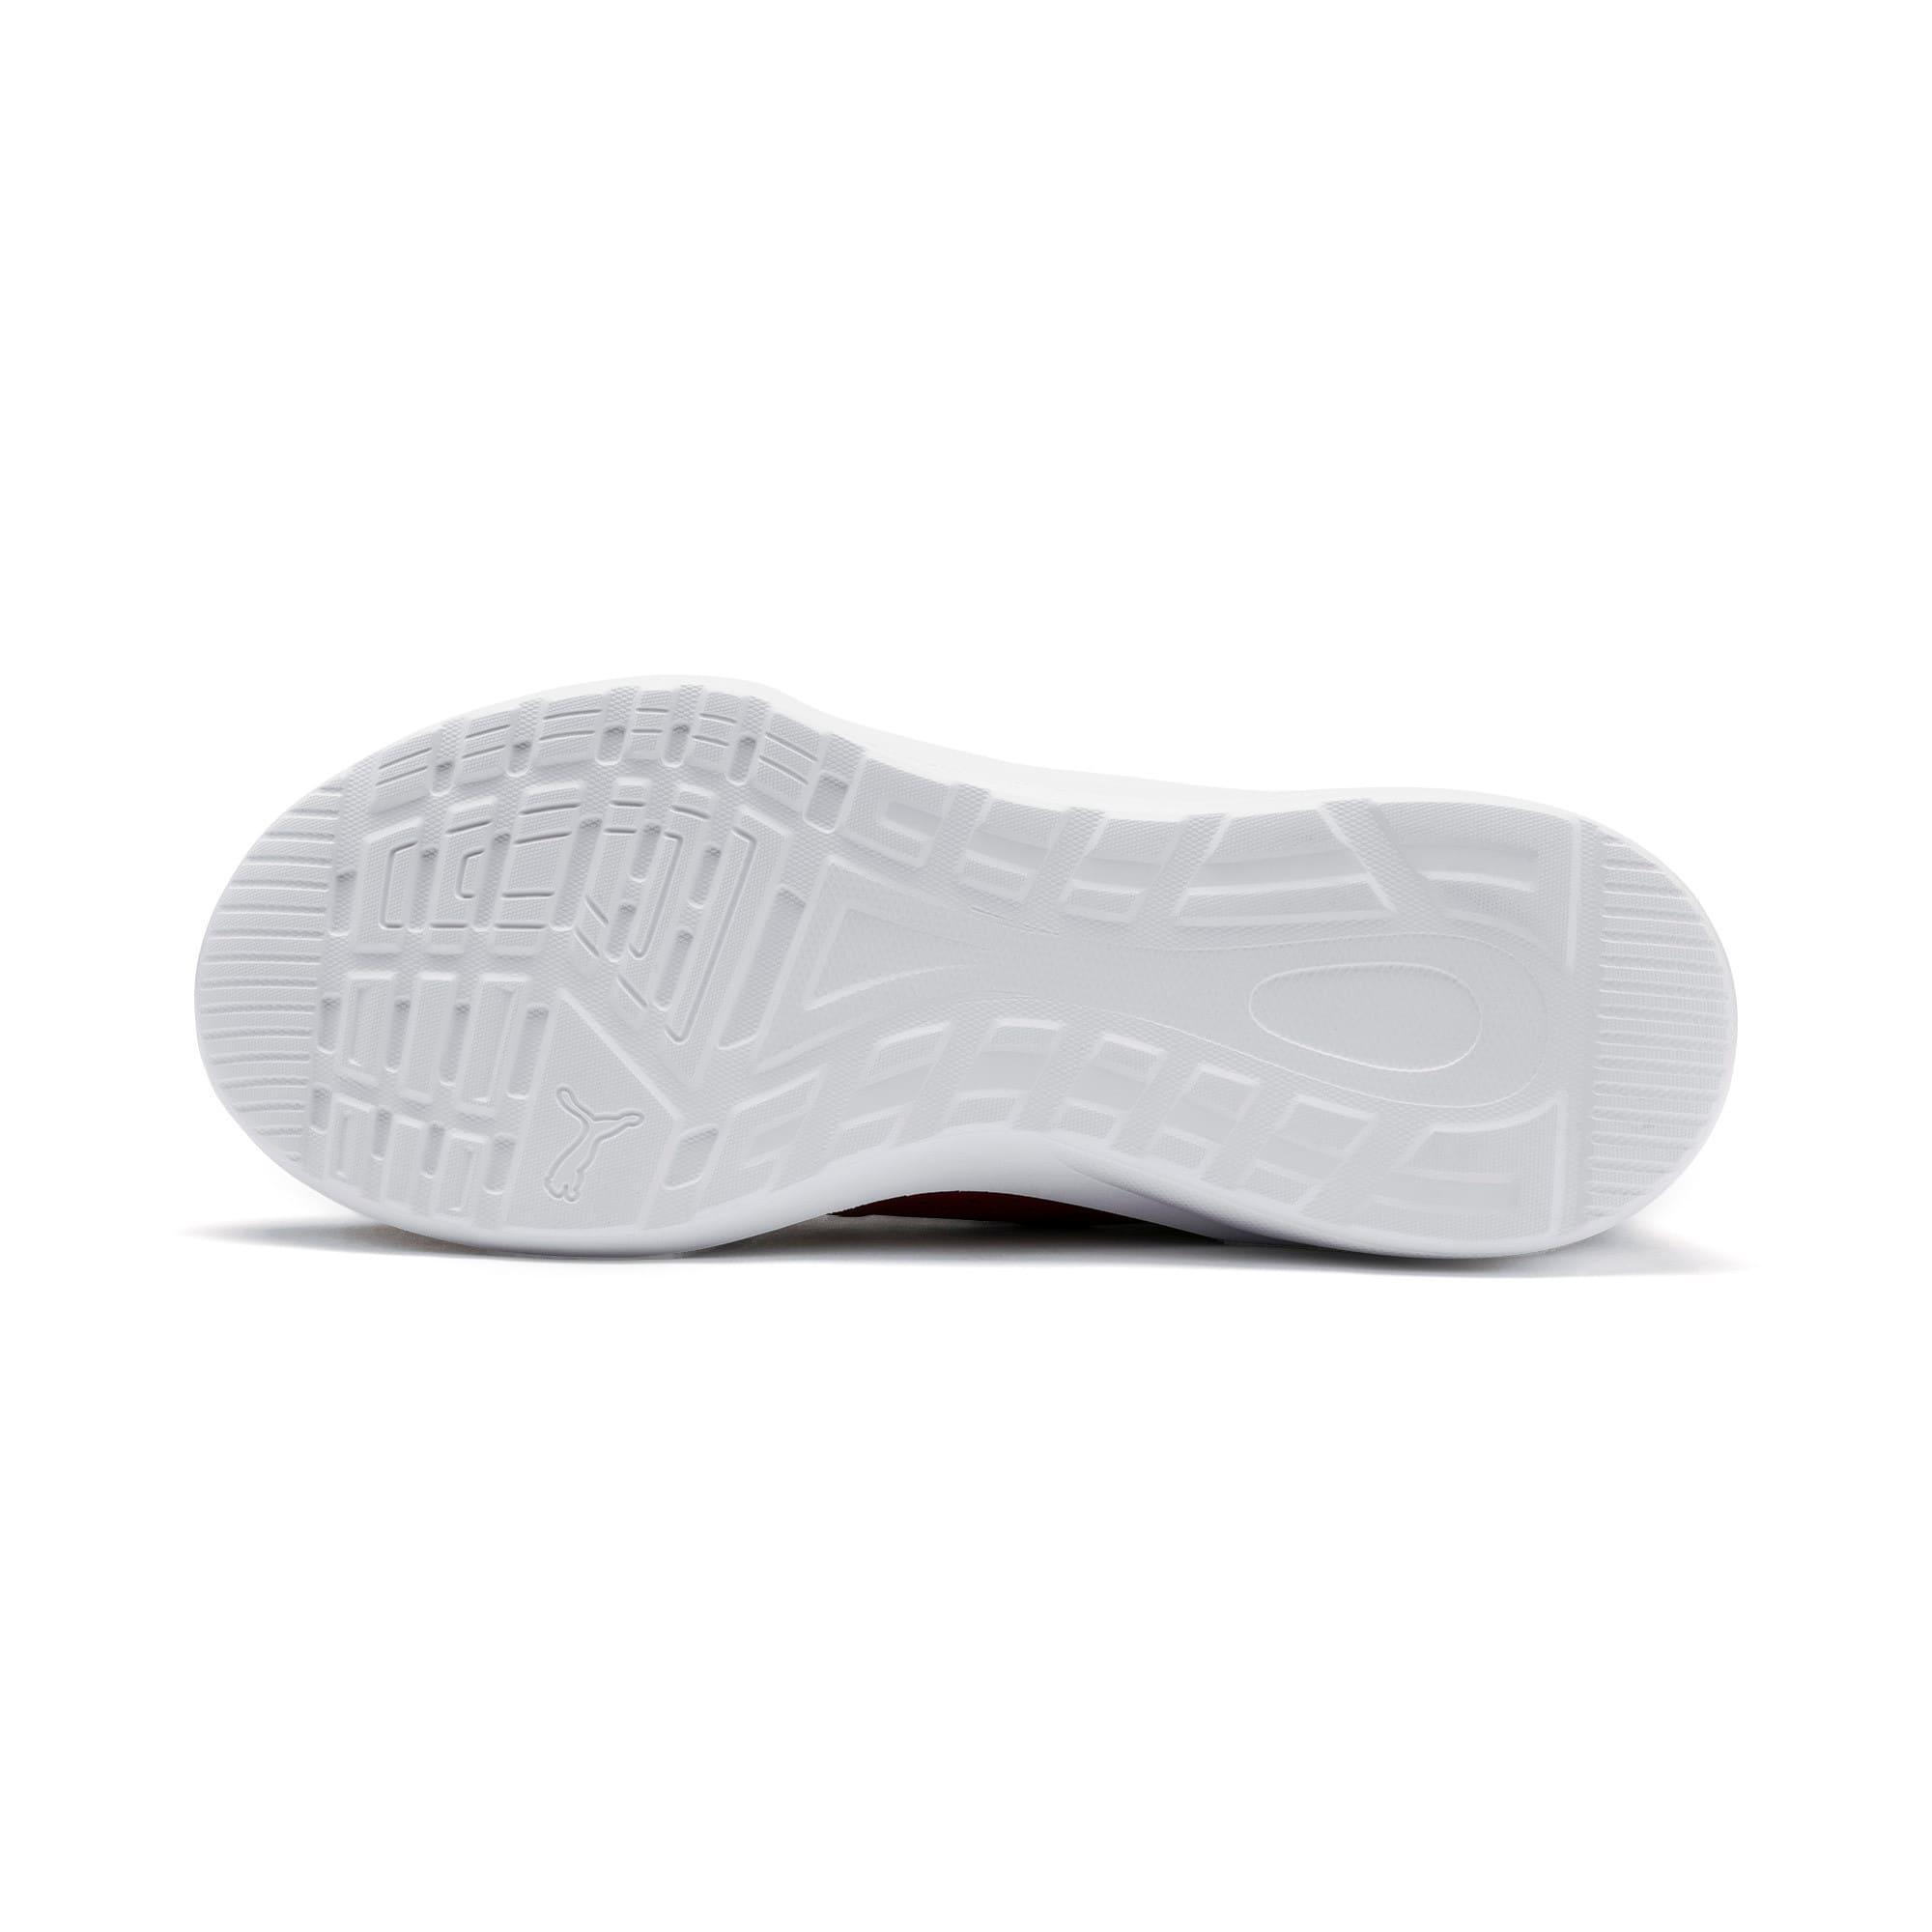 Thumbnail 6 of Emergence Men's Running Shoes, Rhubarb-Puma White, medium-IND